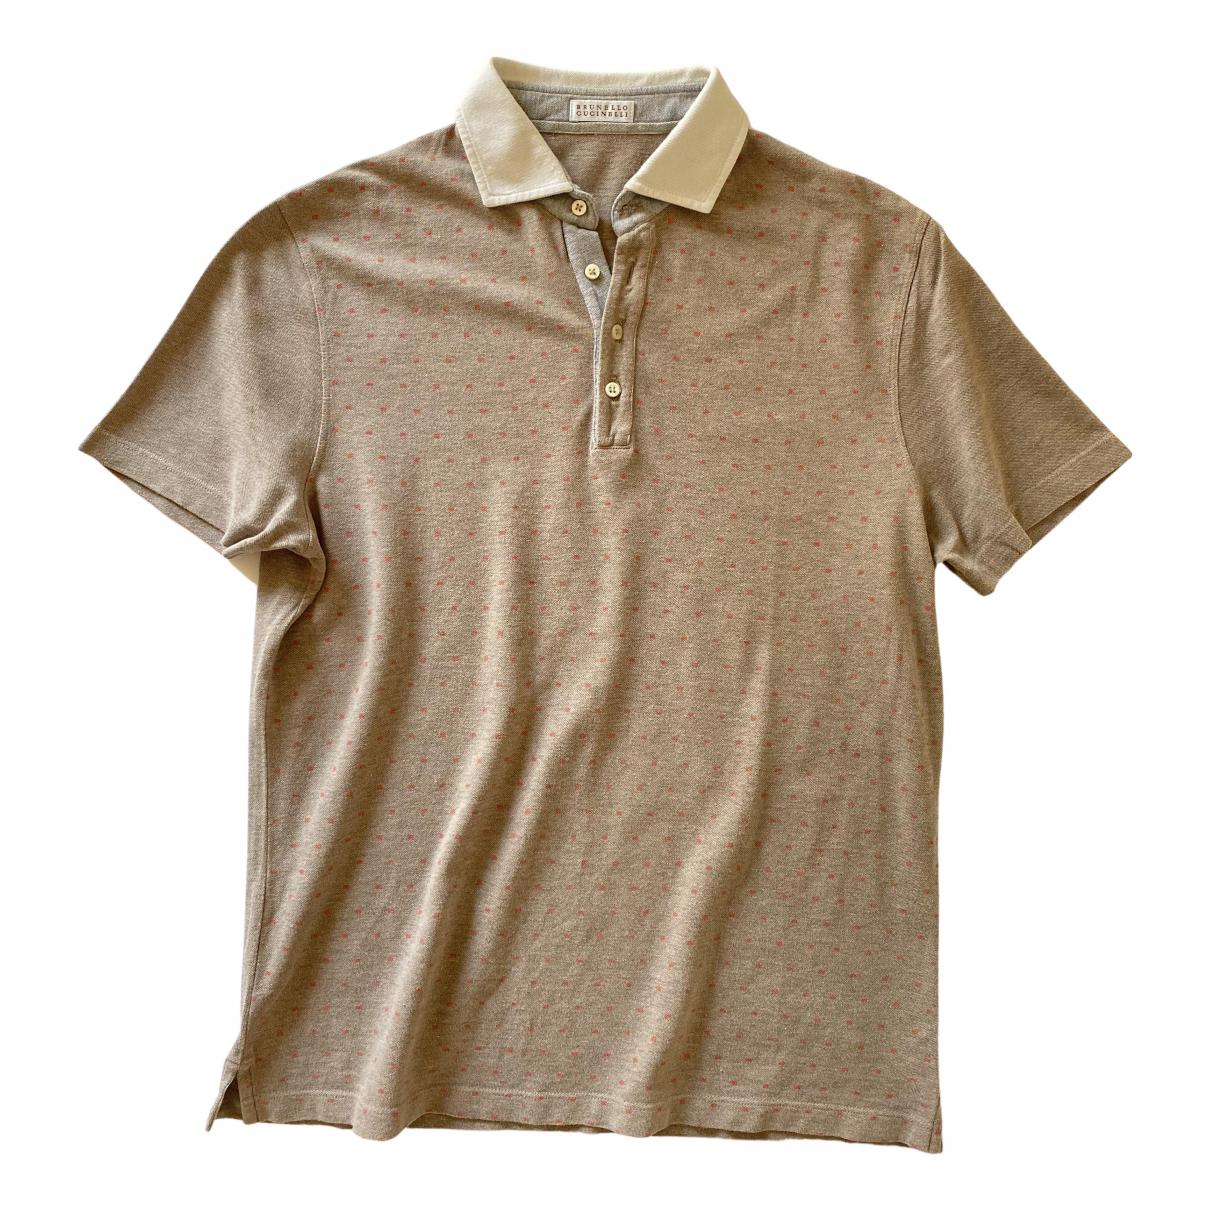 Brunello Cucinelli \N Beige Cotton Polo shirts for Men M International